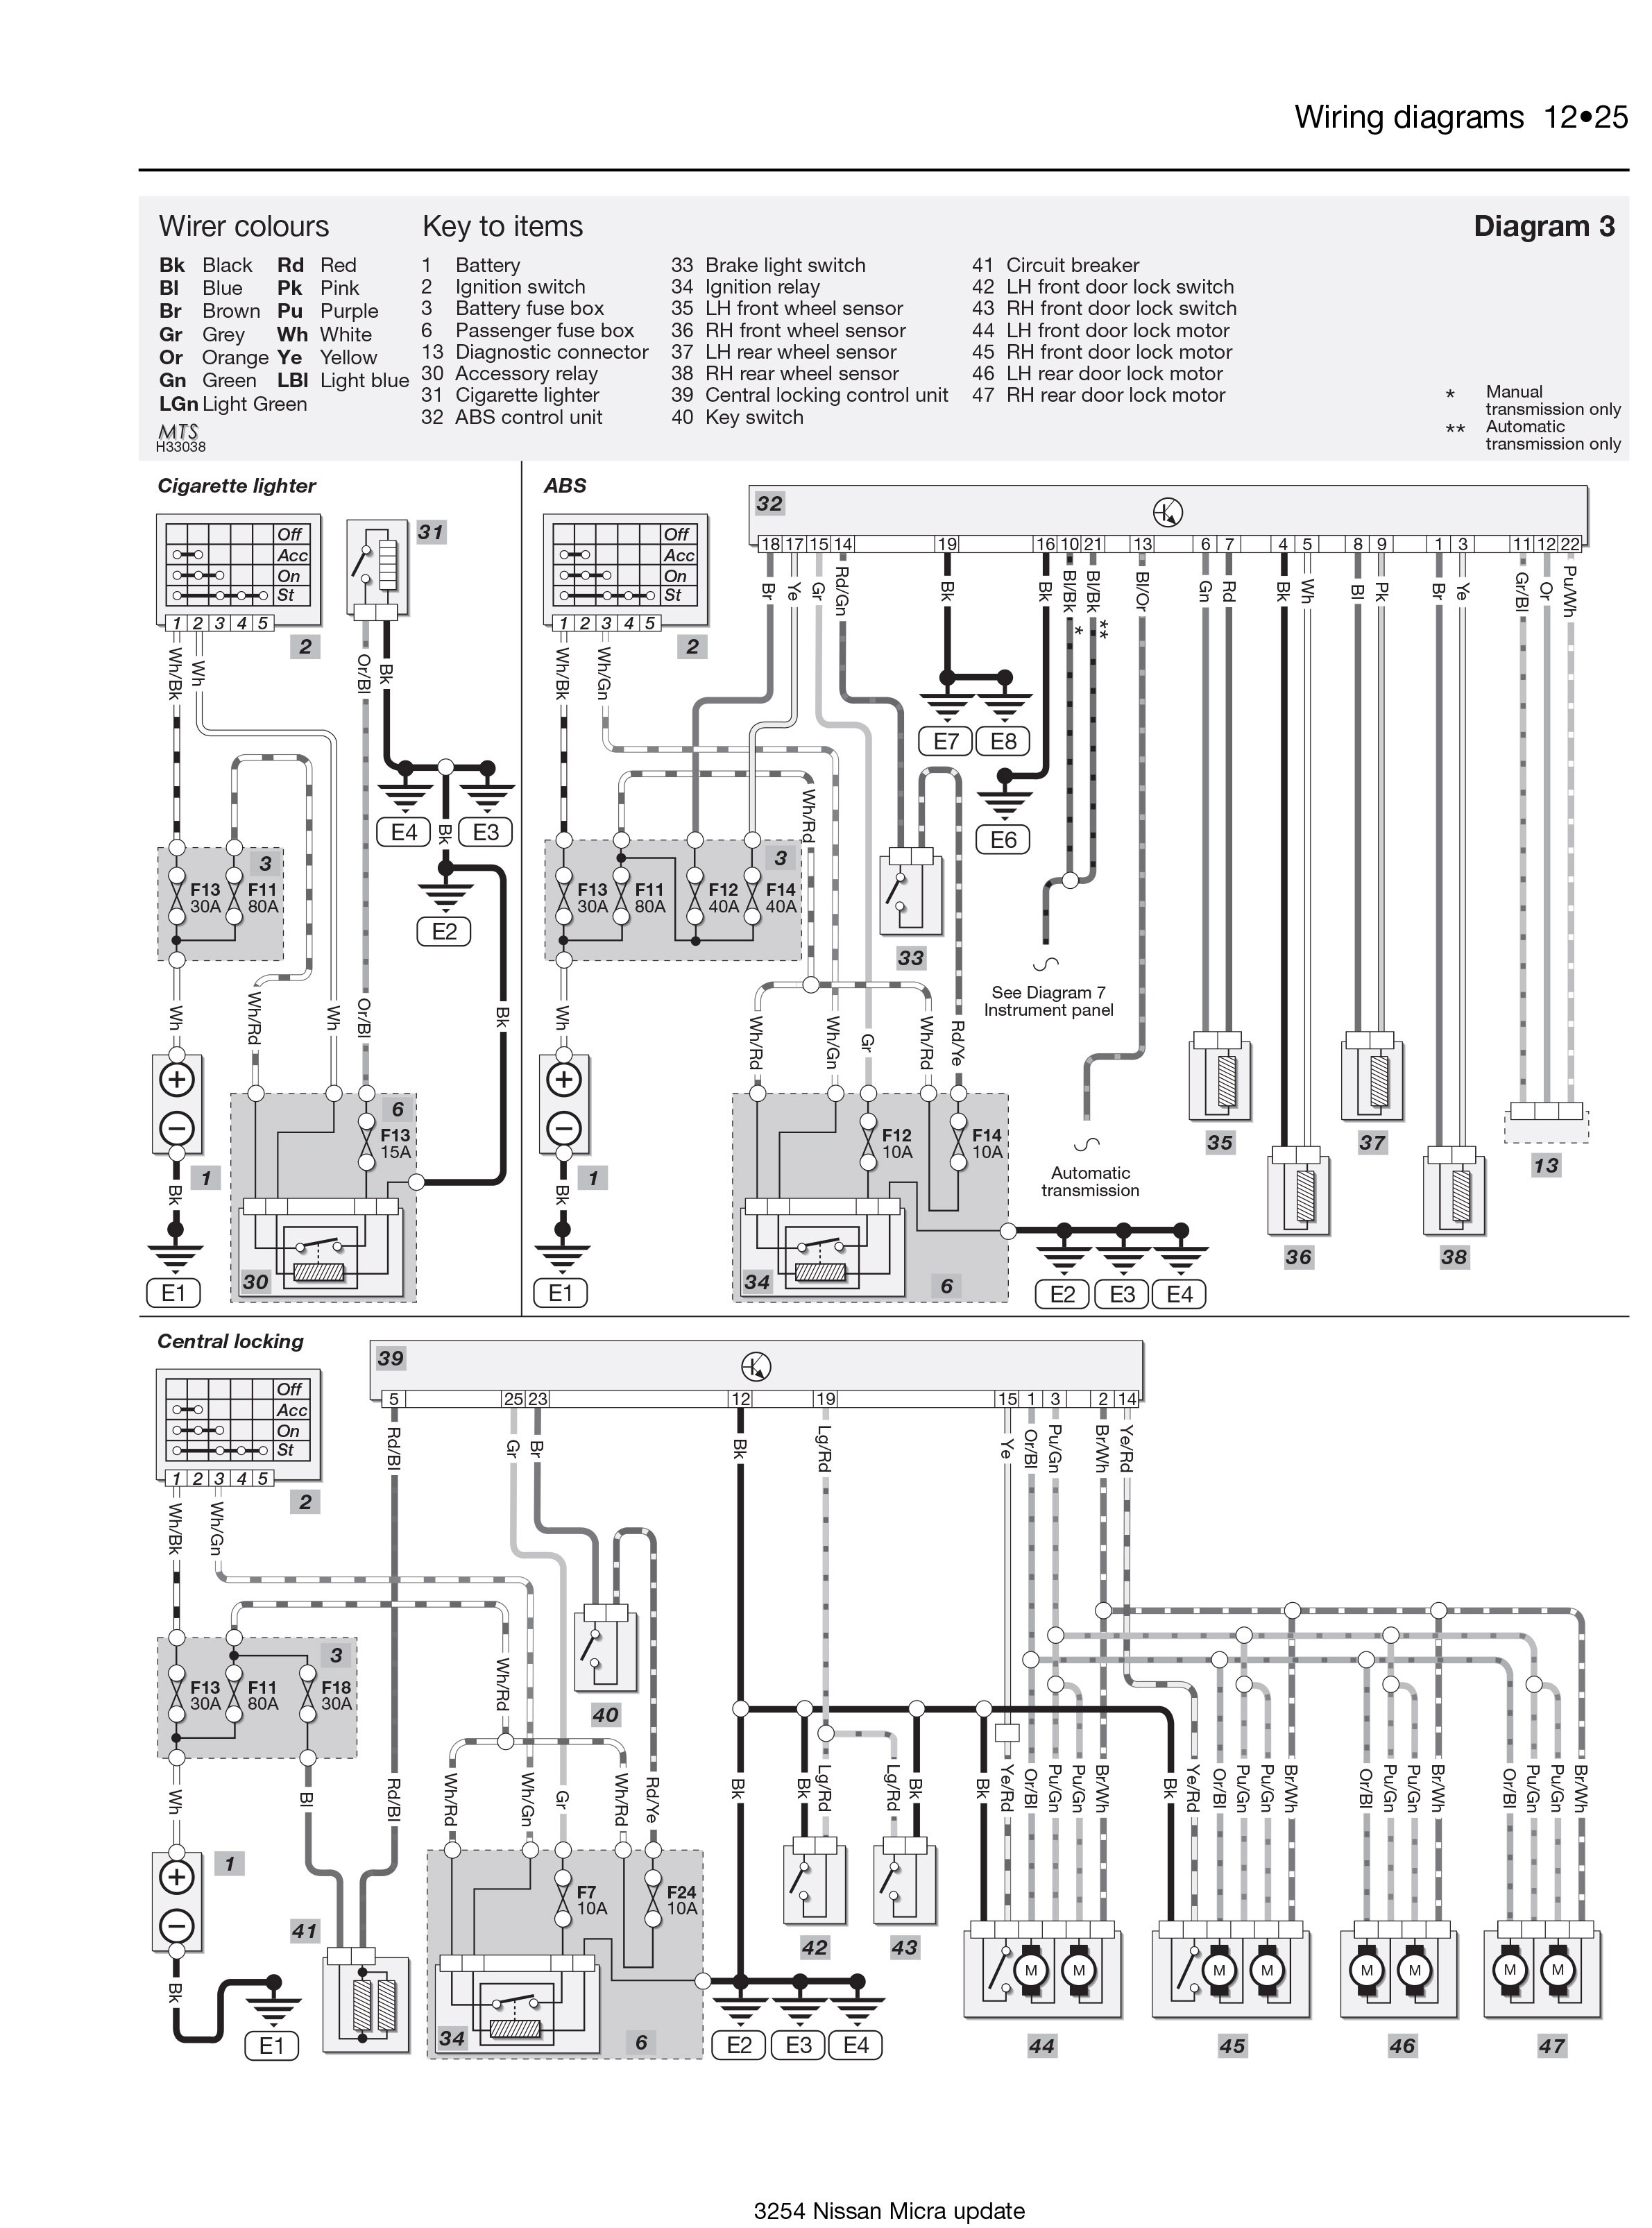 Nissan Micra Engine Diagram Nissan Micra 93 02 Haynes Repair Manual Of Nissan Micra Engine Diagram